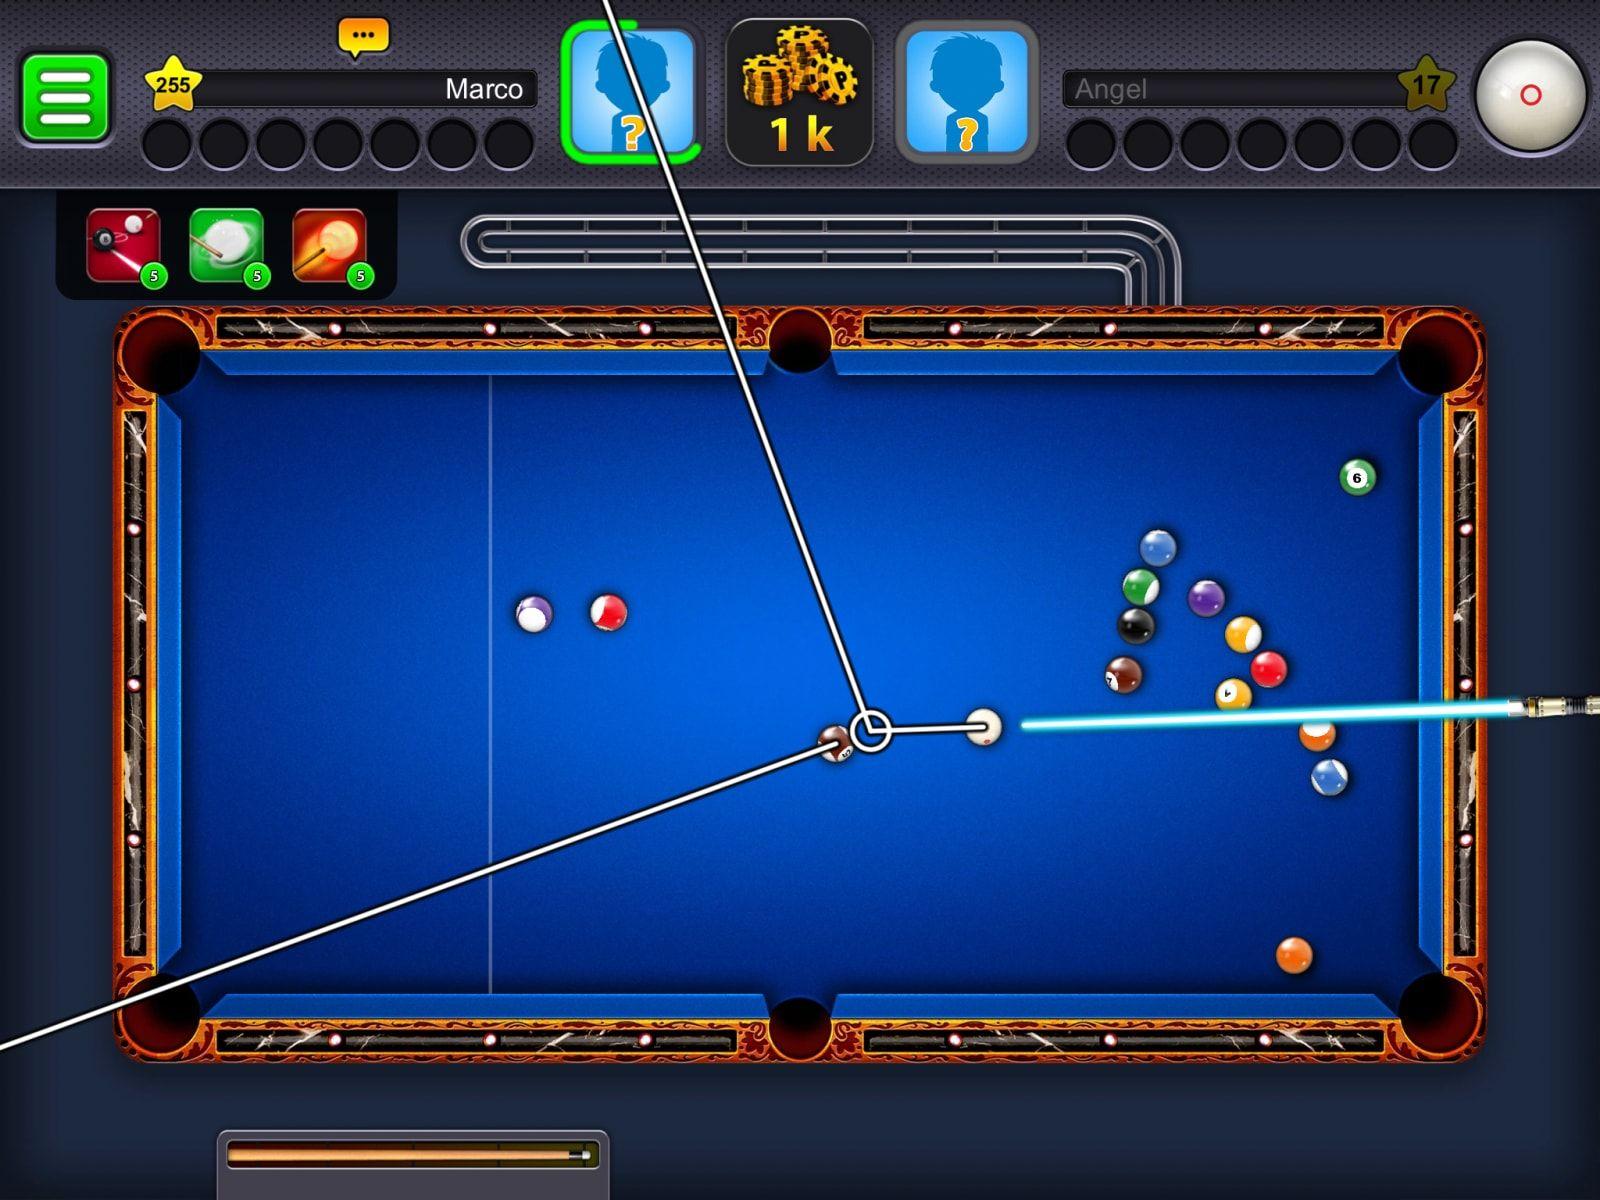 8 Ball Pool Hack 8 Ball Pool Cheats In 2020 Pool Hacks Pool Balls Play Hacks